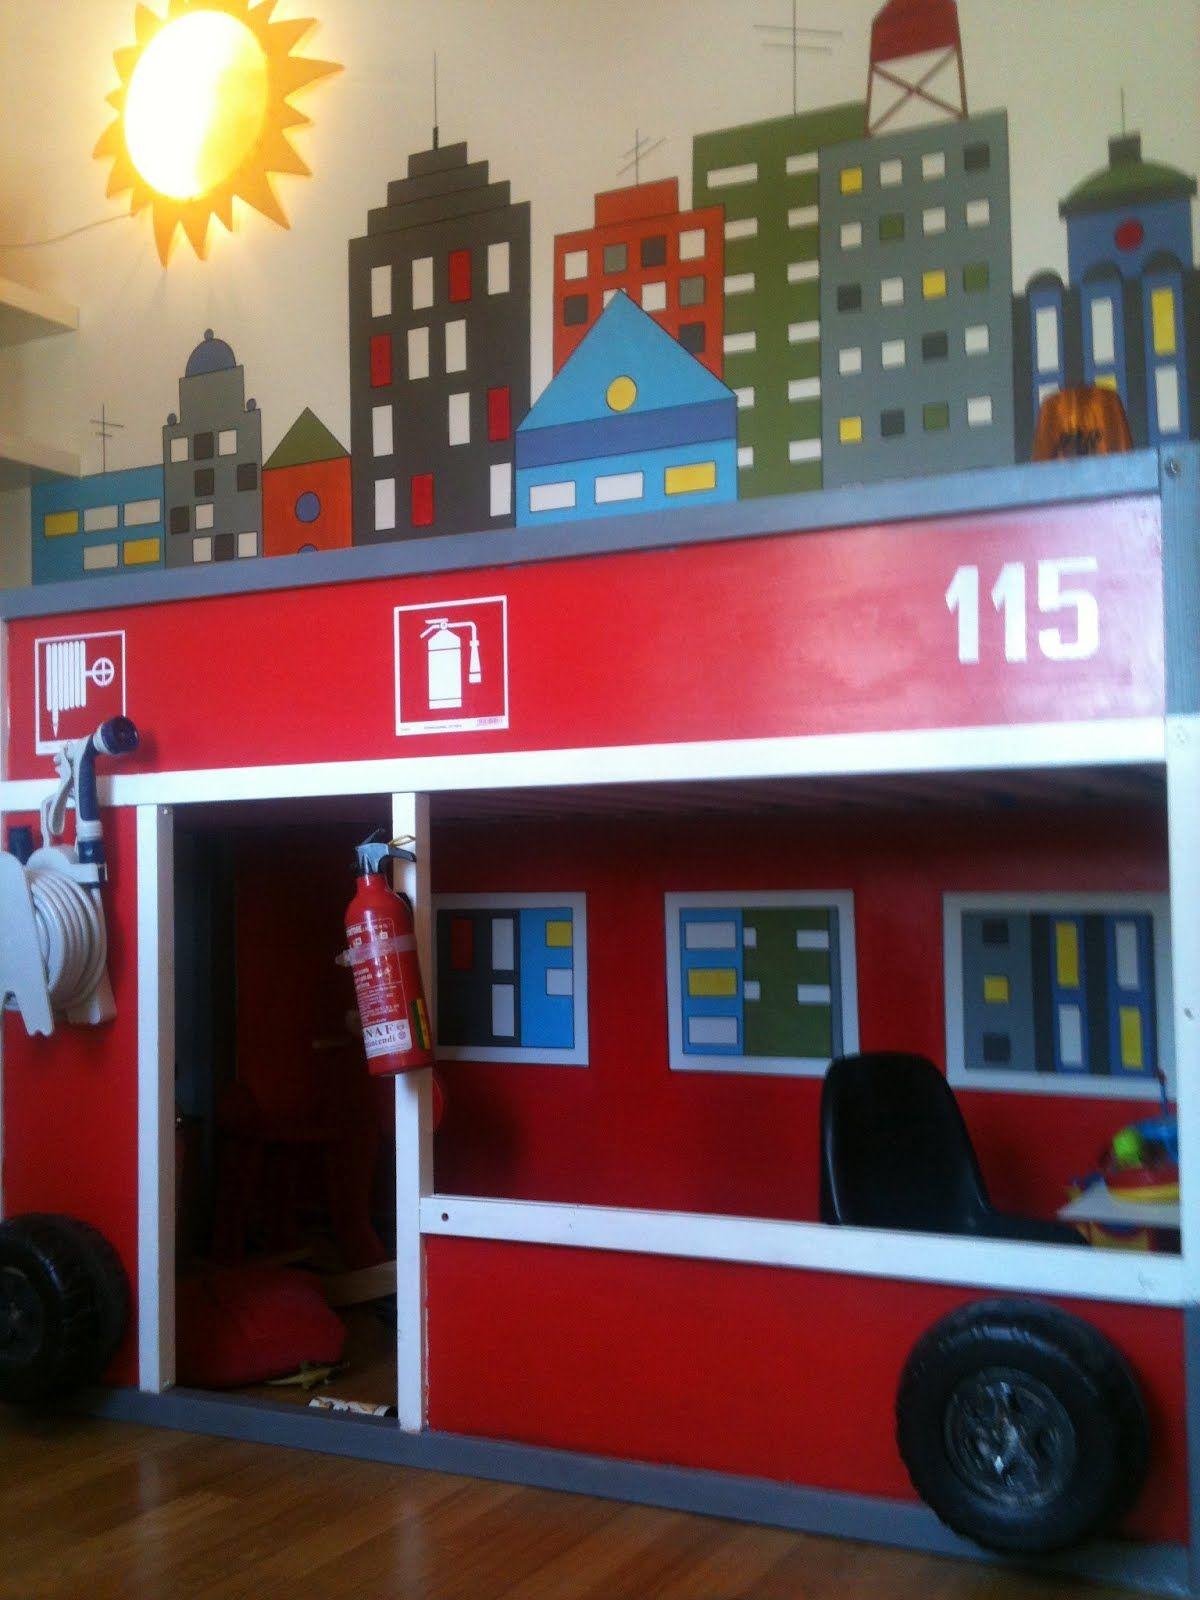 Kura Firetruck Design Ideas For Kid S Rooms Ikea Kura Bed Room